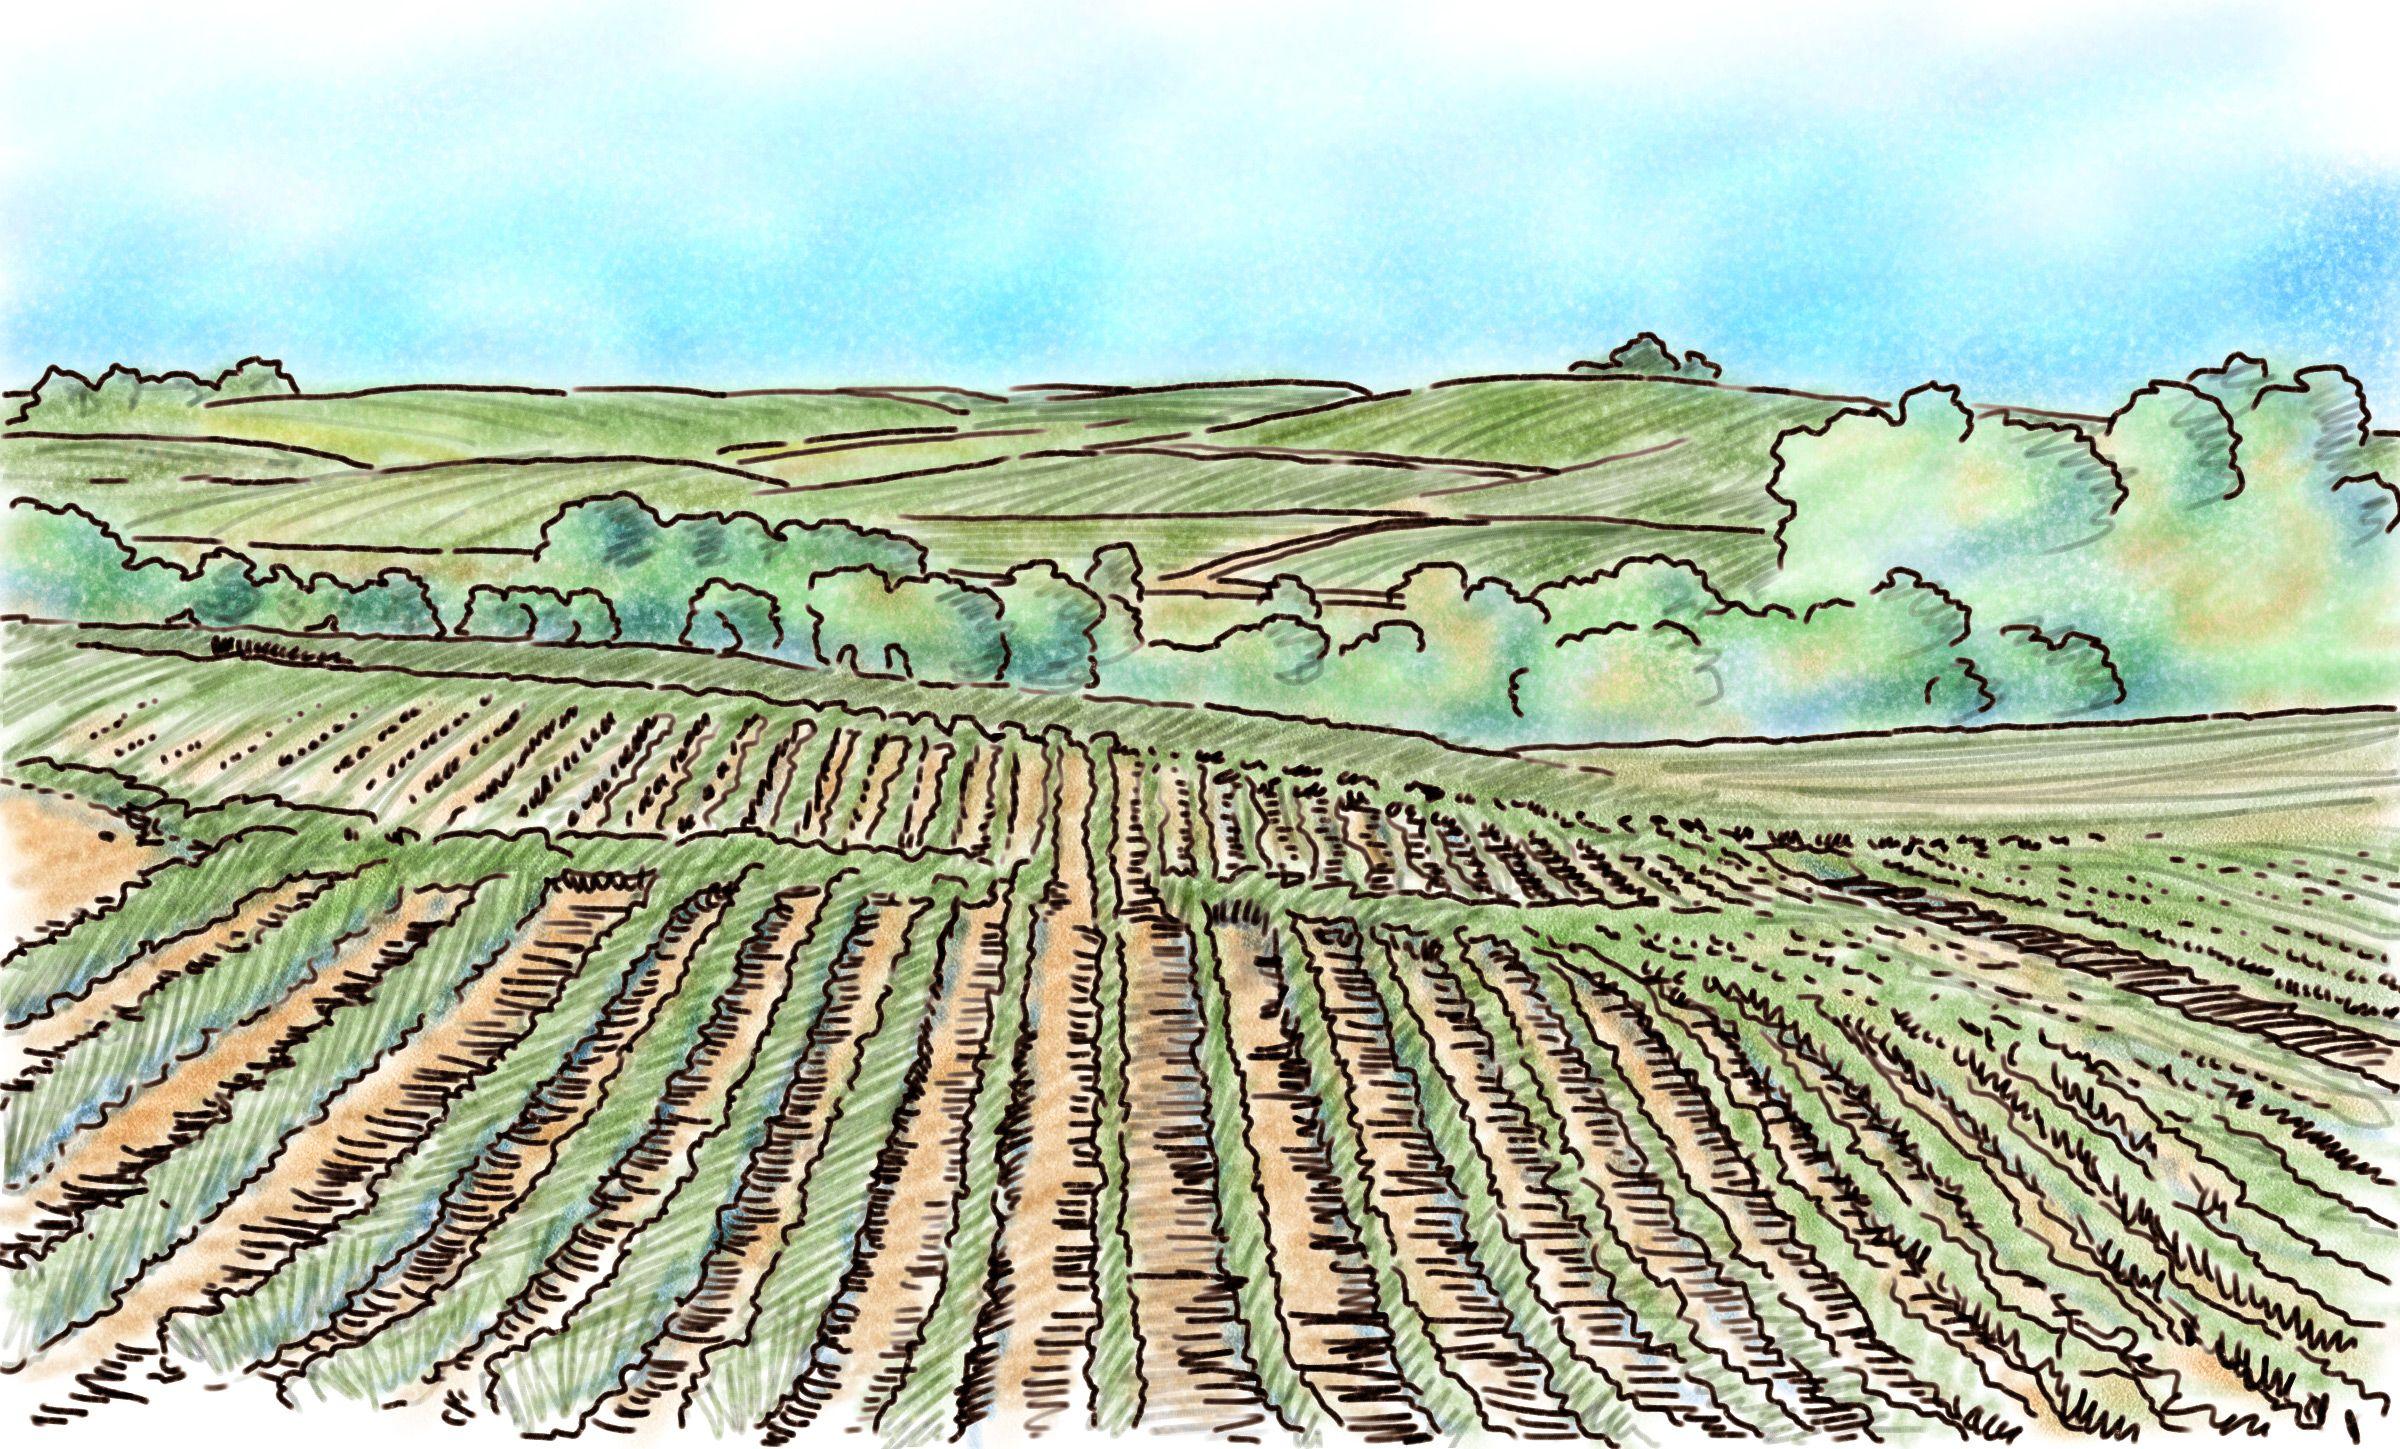 2400x1449 Augustin Luca Farm Fields.jpg Illustration 272